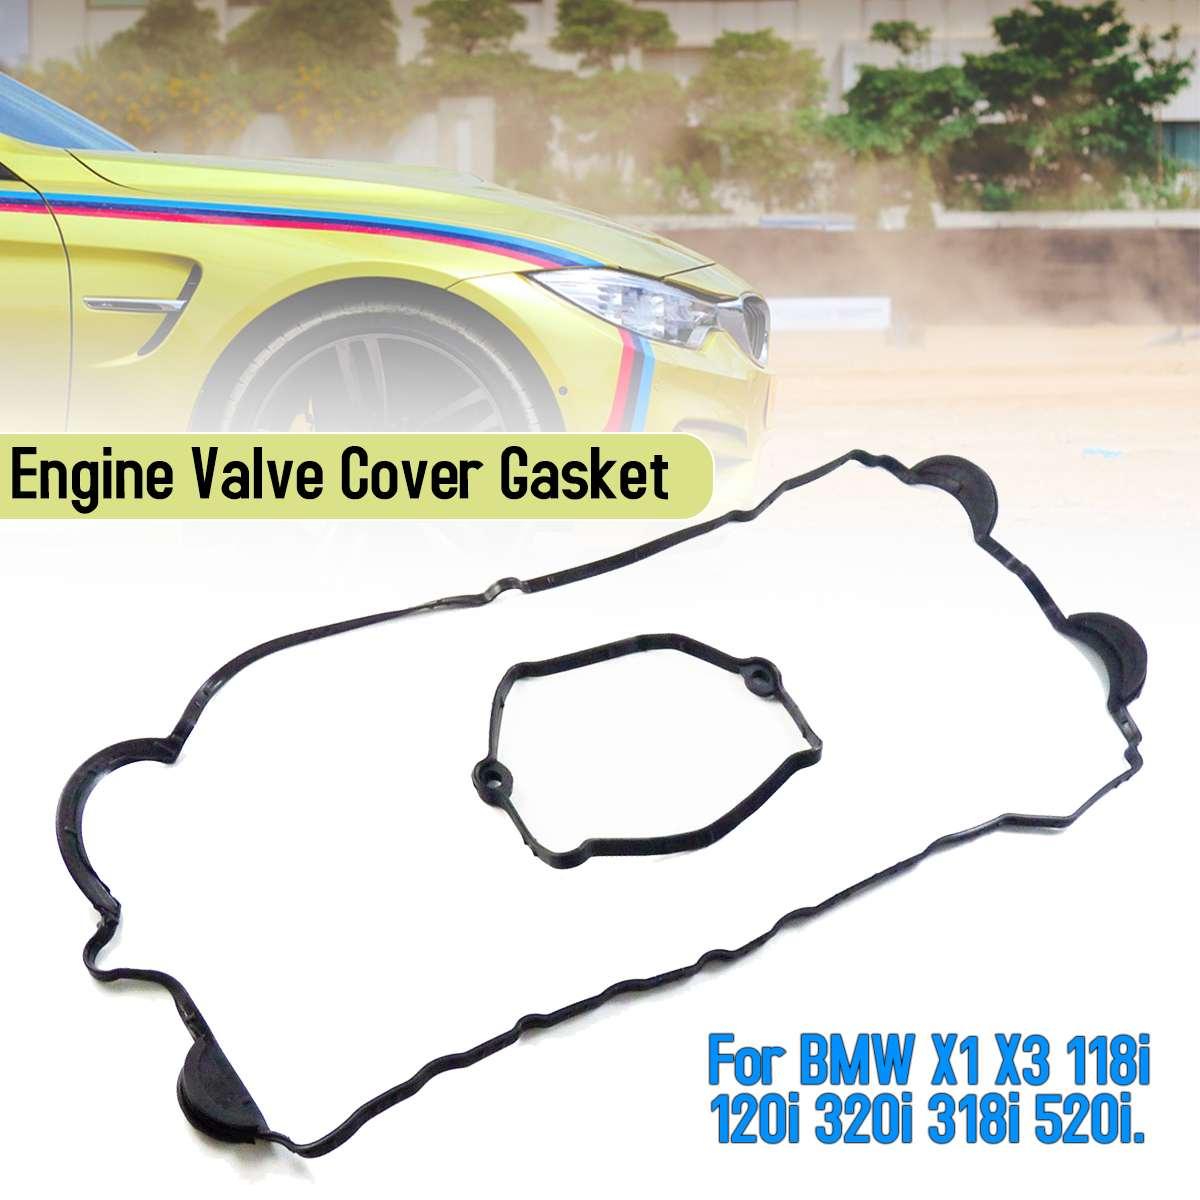 Engine Valuve Cover Gasket For BMW Car X1 X3 118i 120i 320i 318i 520i 11120035738 Auto Replacement Parts Black ACM Rubber